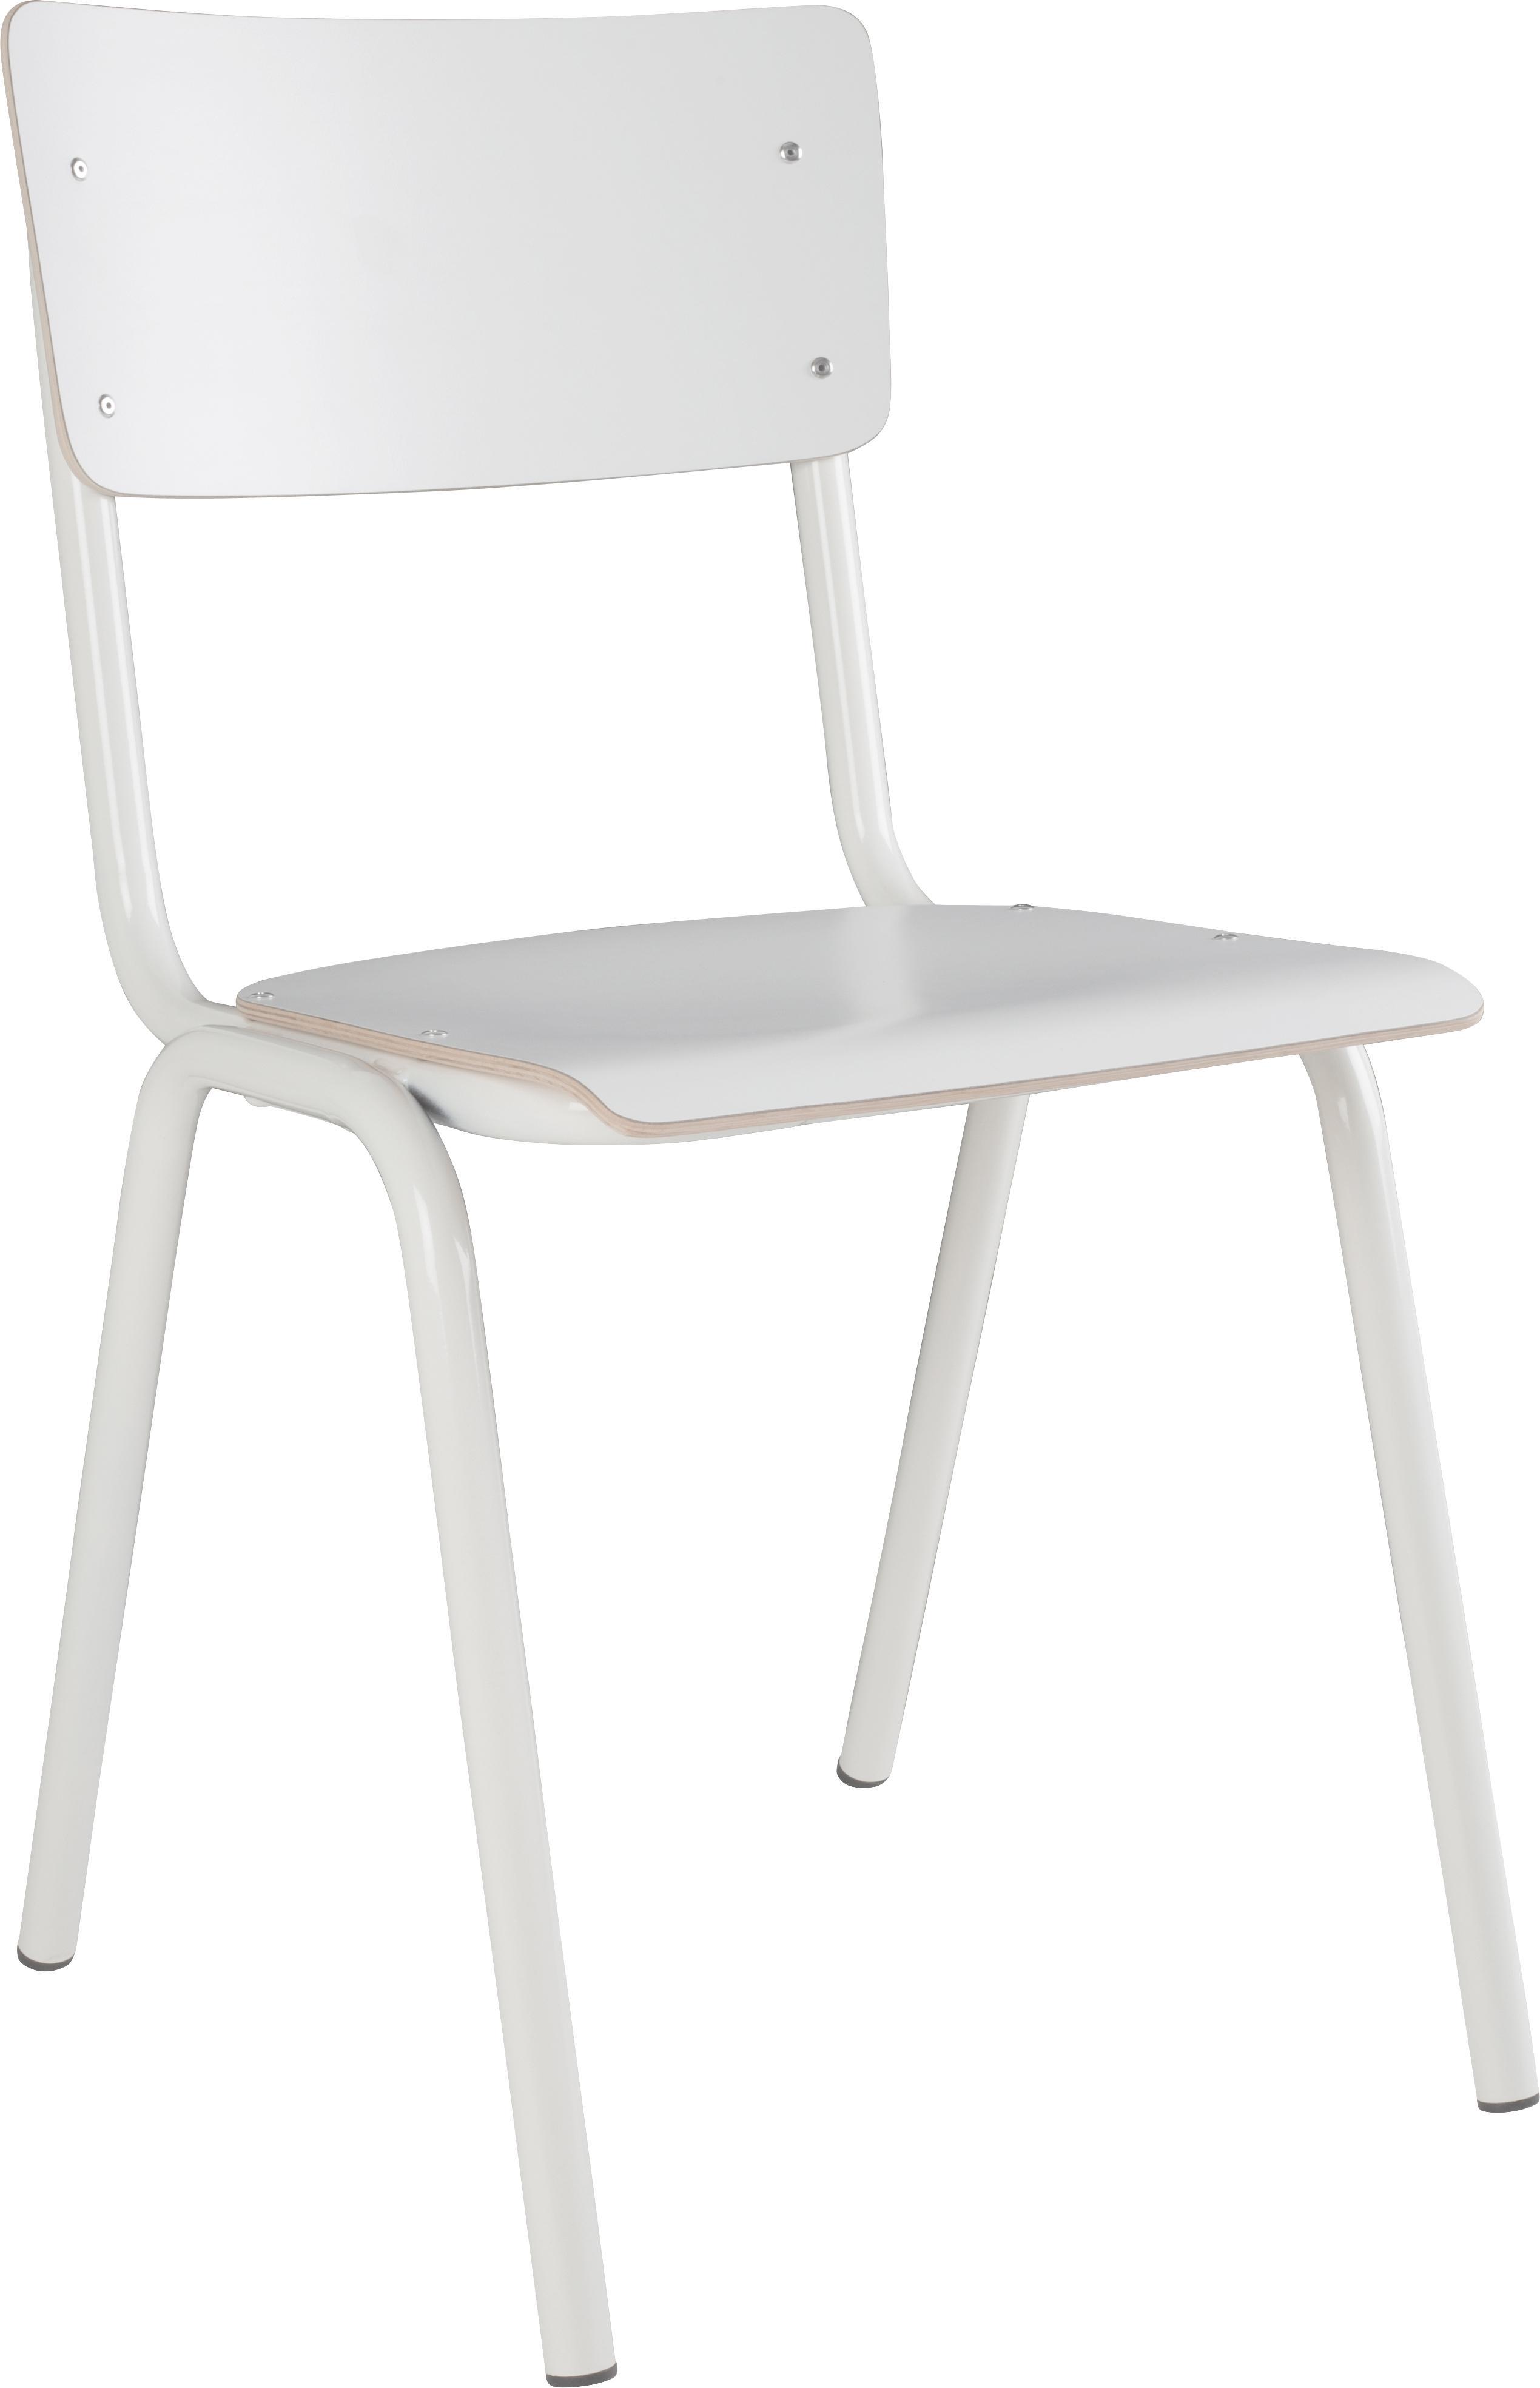 Sedia Back to School, 4 pz., Gambe: metallo verniciato a polv, Seduta: laminato, Bianco, Larg. 43 x Alt. 83 cm